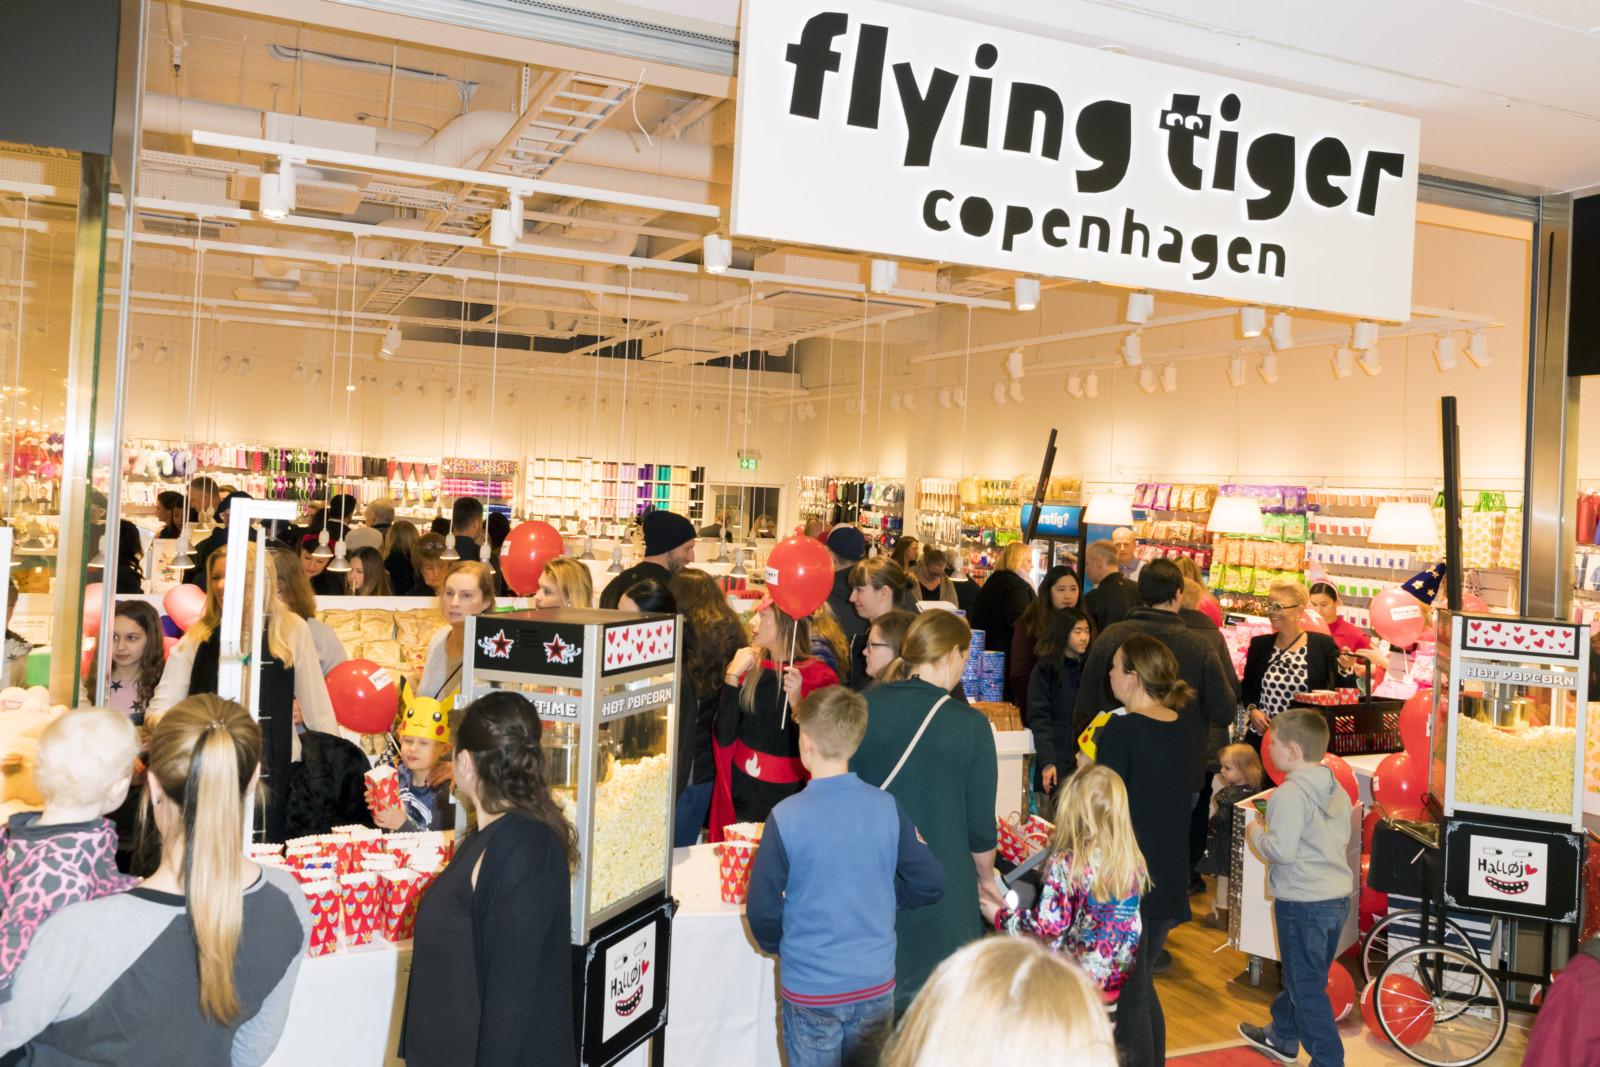 flying tiger copenhagen butiksinvigning i t by centrum petr pr eventbyr. Black Bedroom Furniture Sets. Home Design Ideas